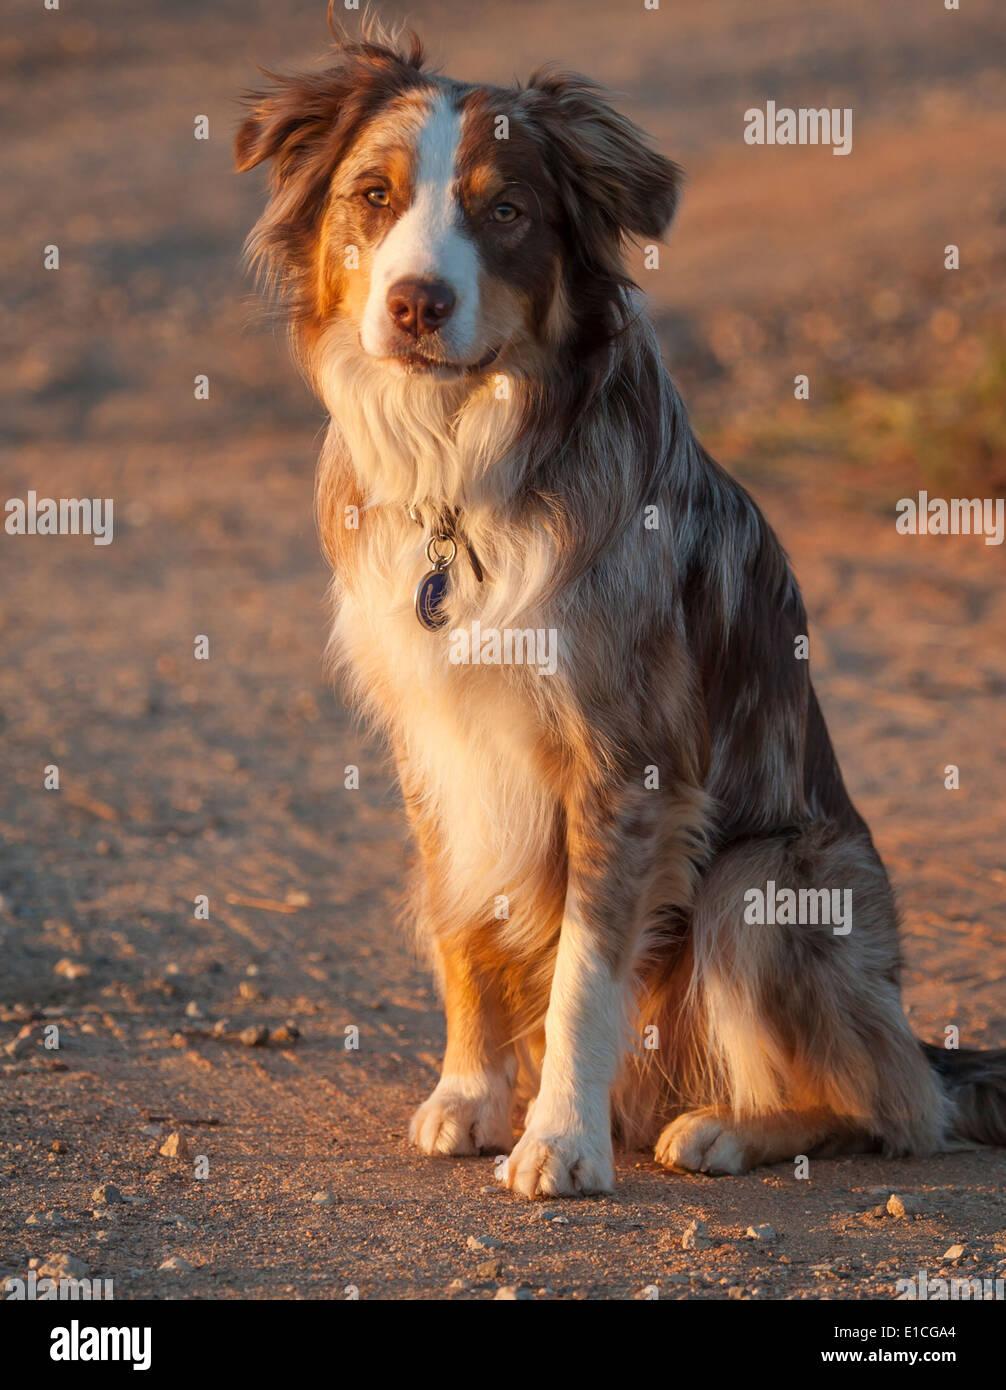 Australian Cattle Dog-Border Collie mix - Stock Image